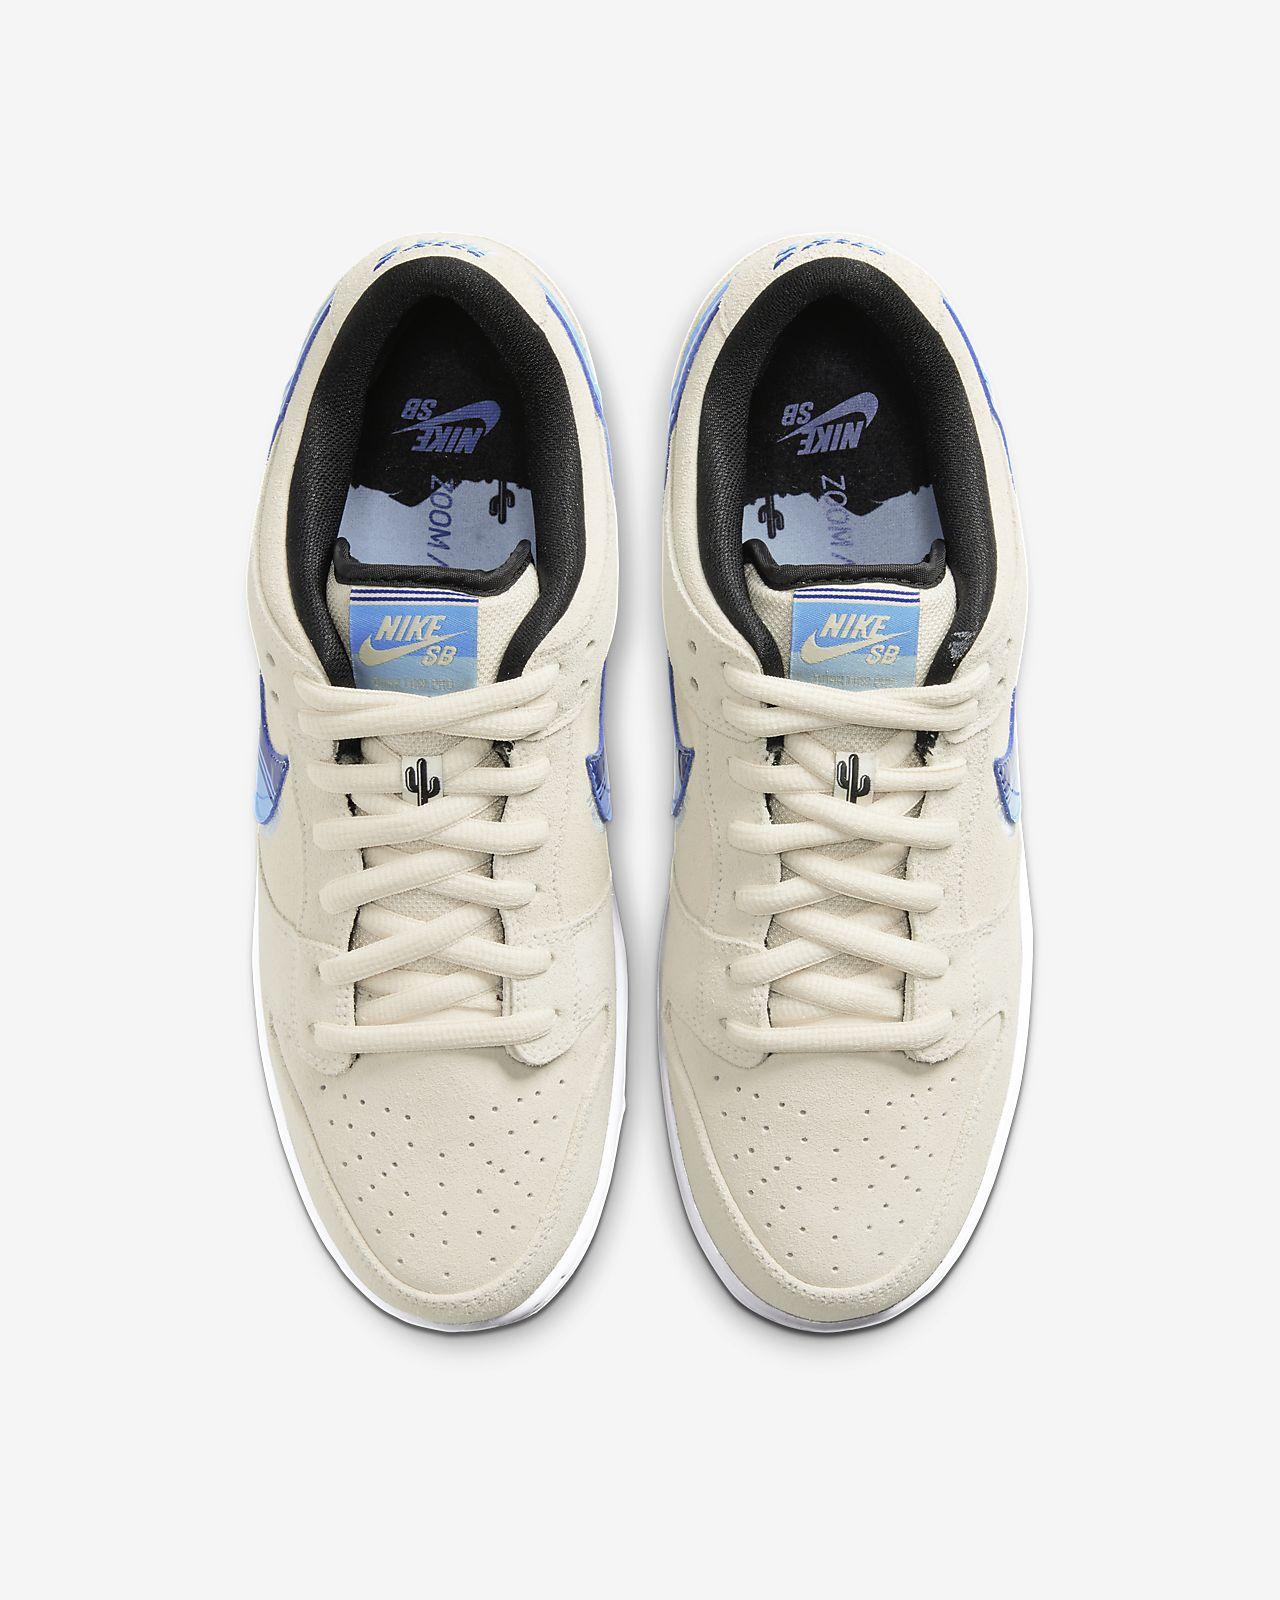 Chaussure de skateboard Nike SB Dunk Low Pro